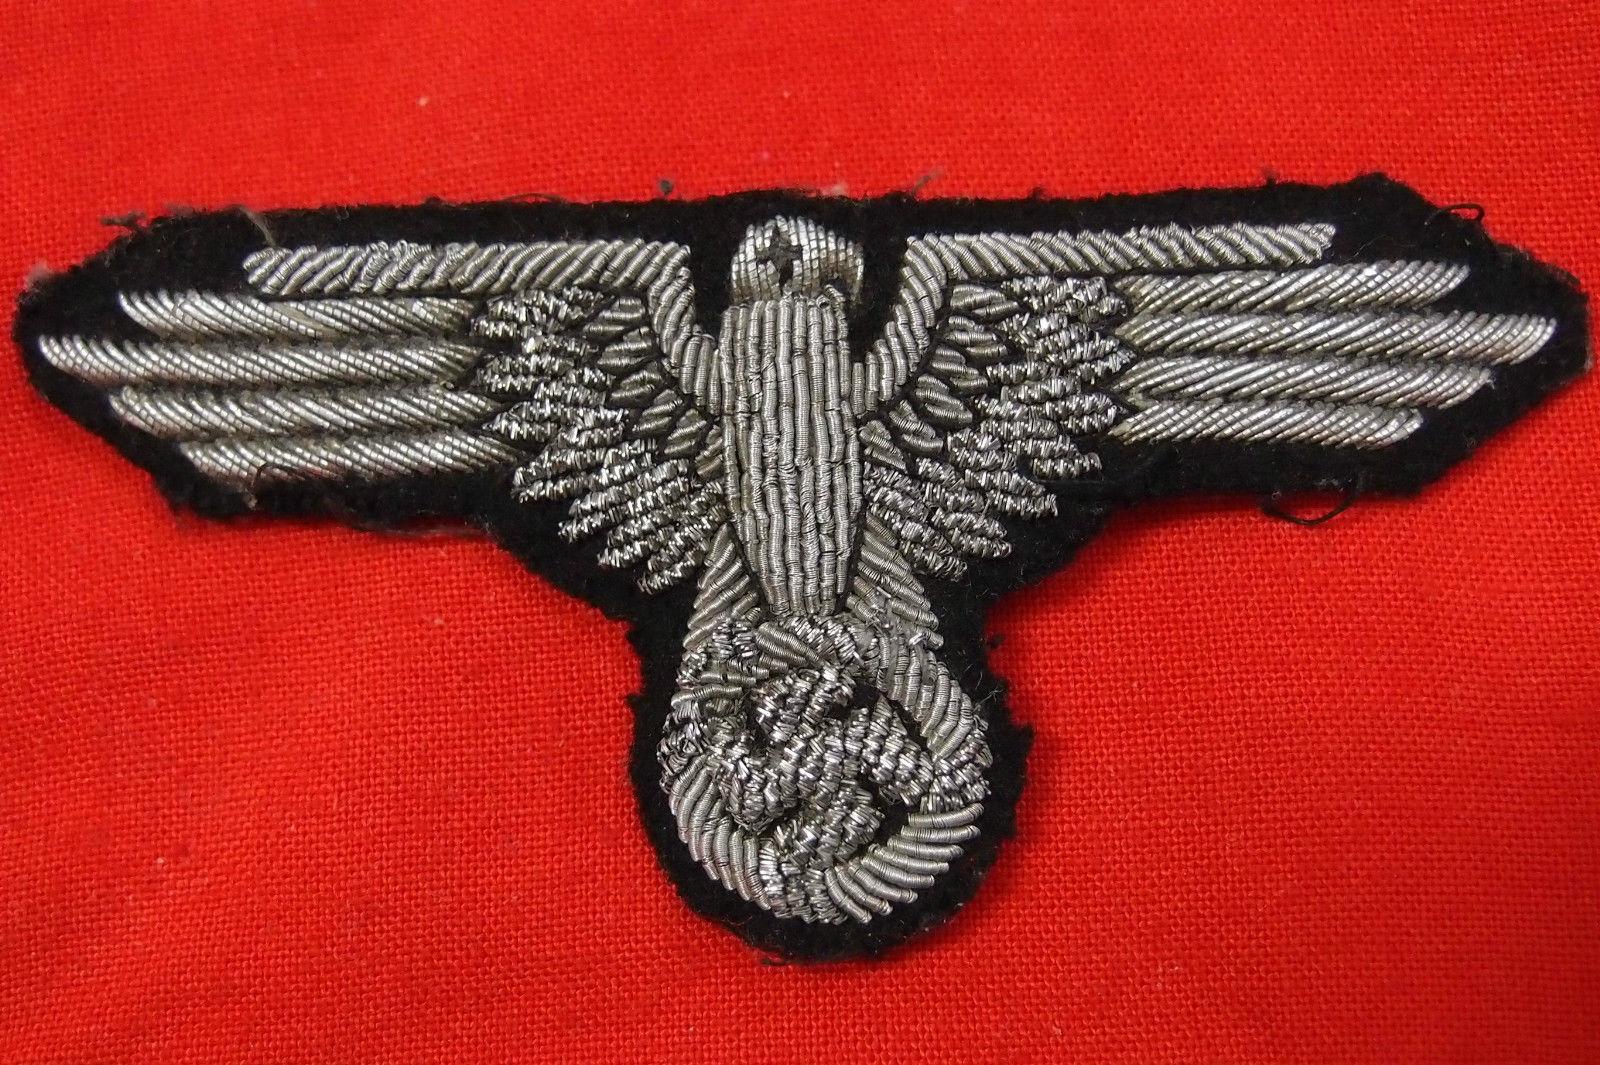 WW2 GERMAN WAFFEN SS OFFICER'S UNIFORM EAGLE